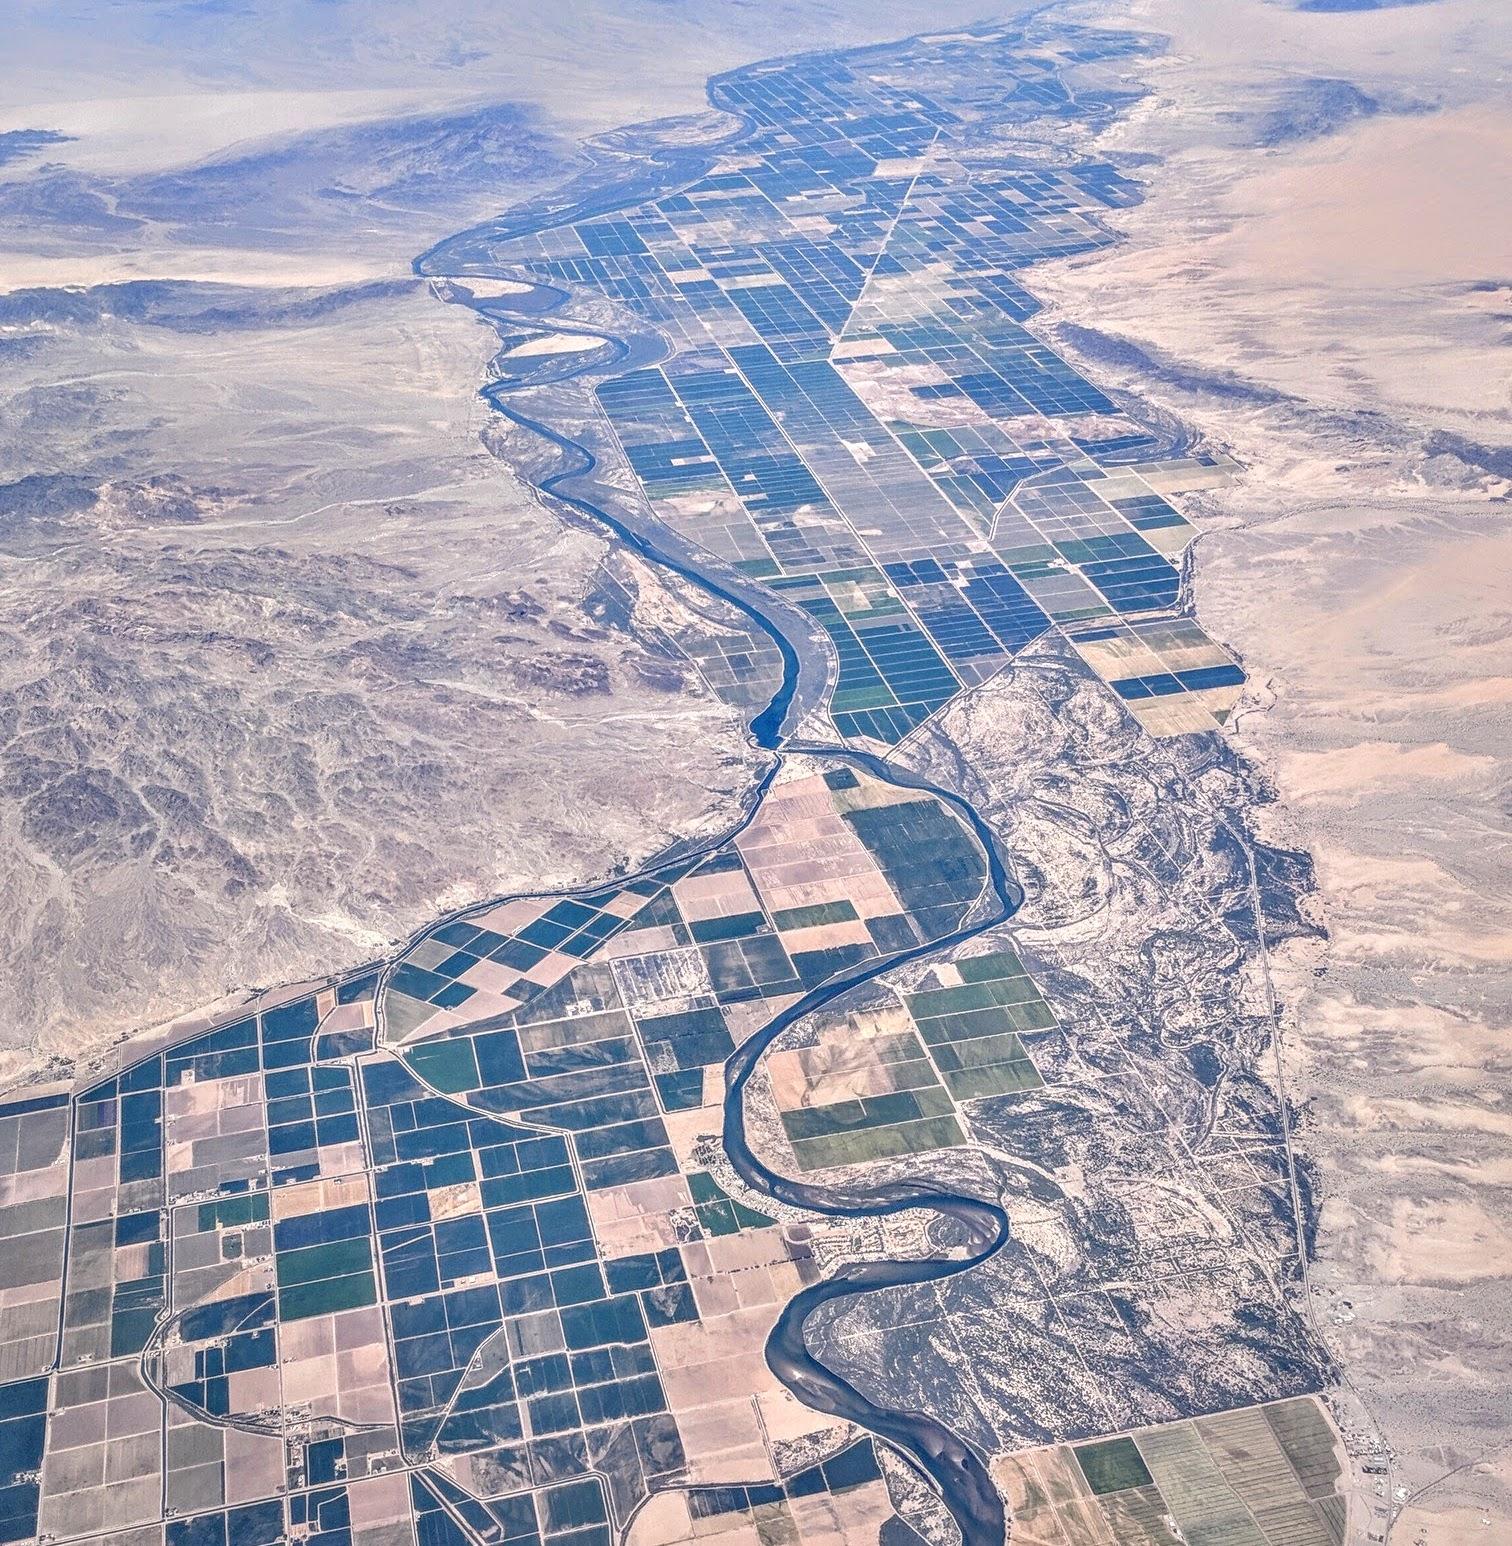 Palo Verde Valley farms